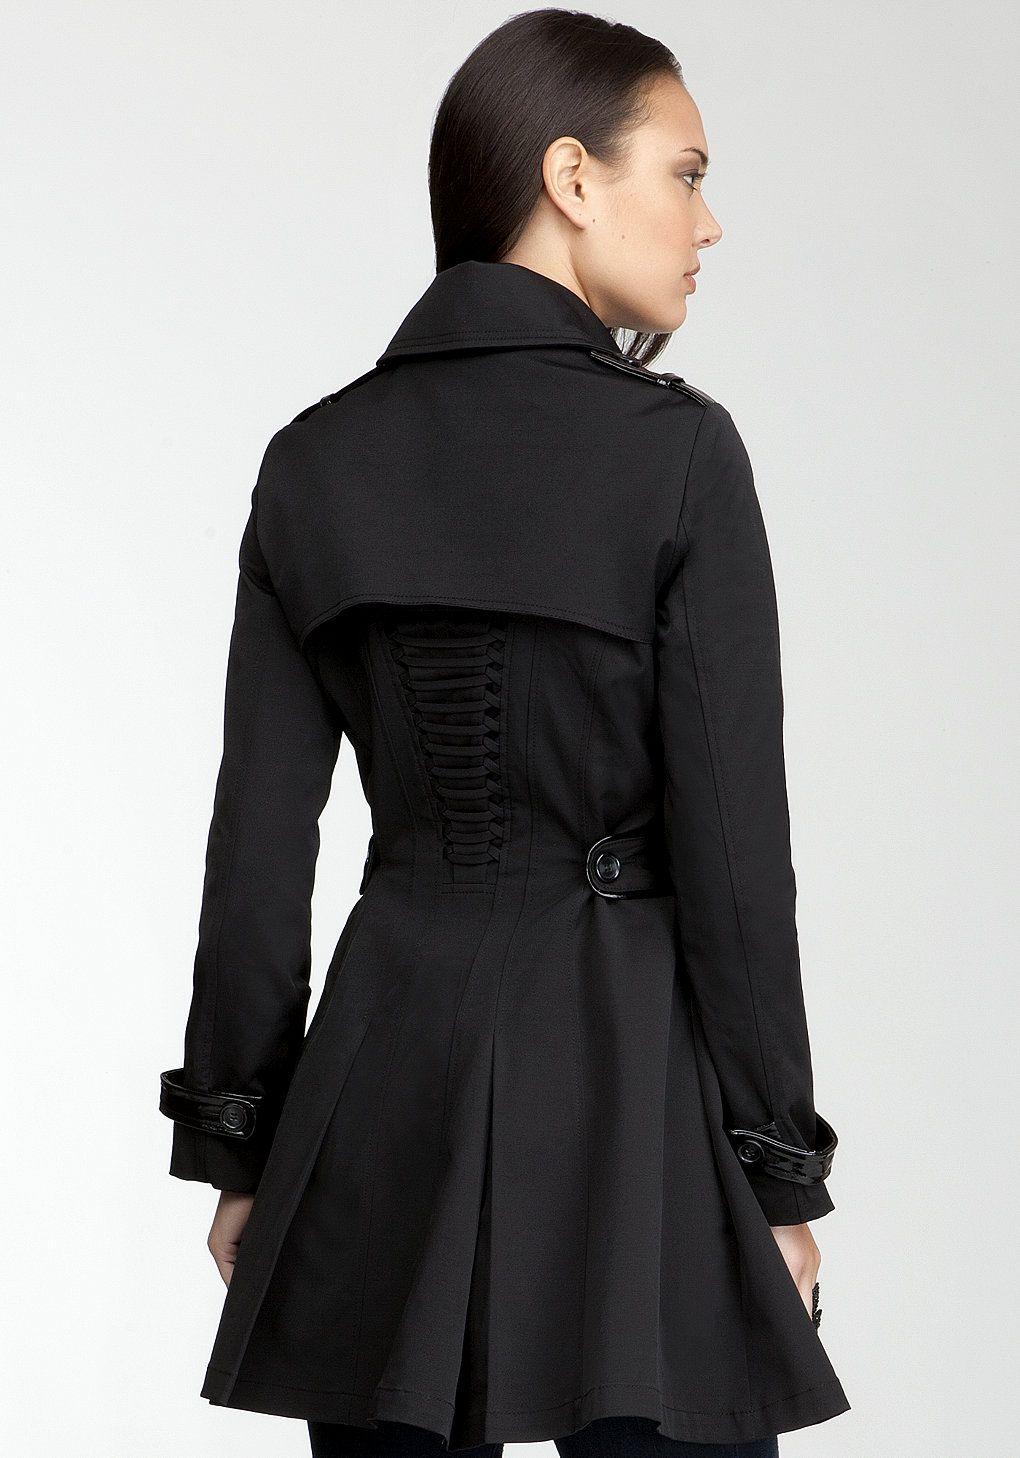 Bebe black leather trim corset dress